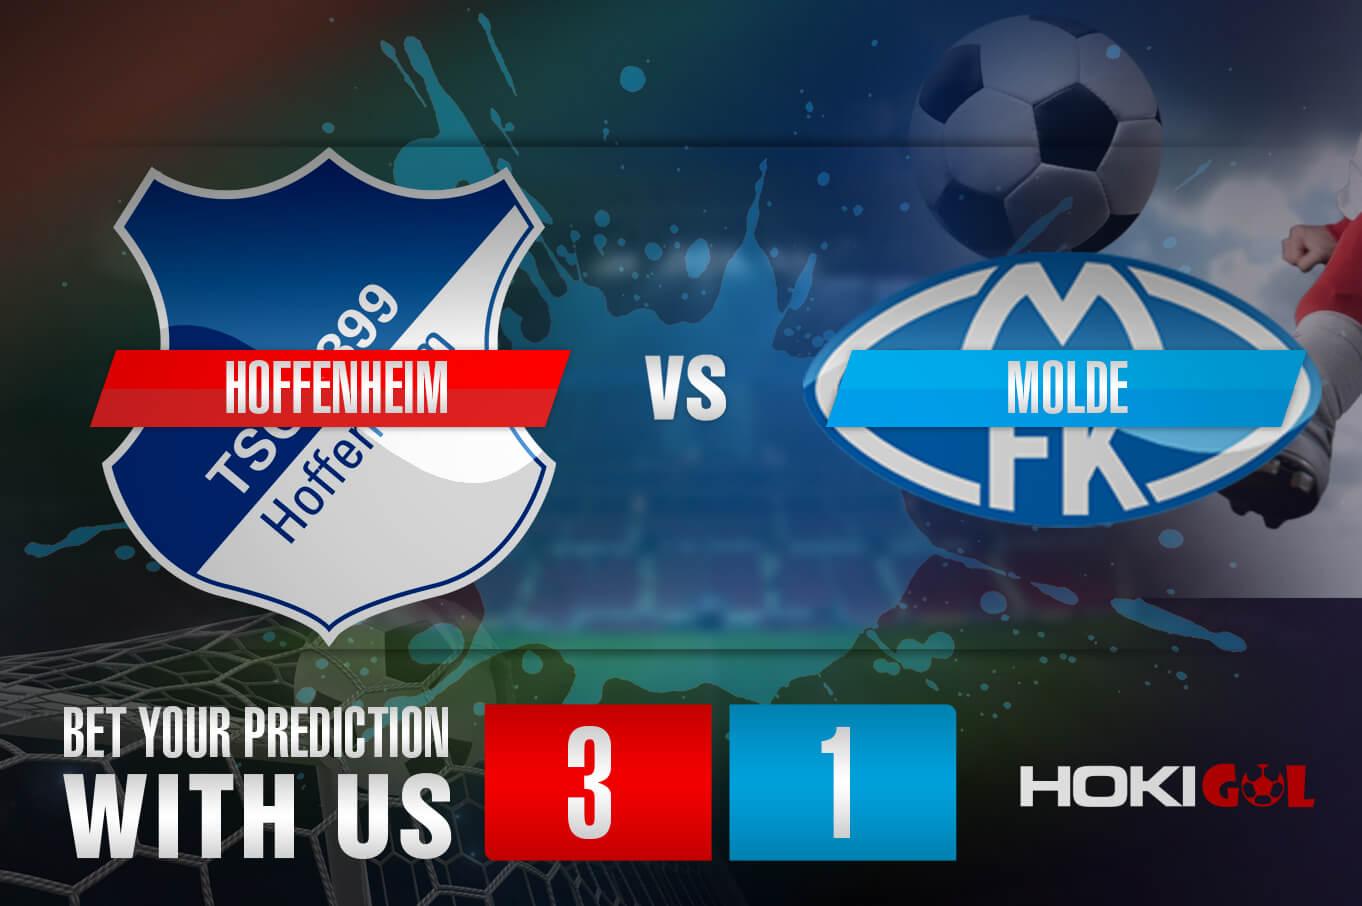 Prediksi Bola Hoffenheim Vs Molde 26 Februari 2021